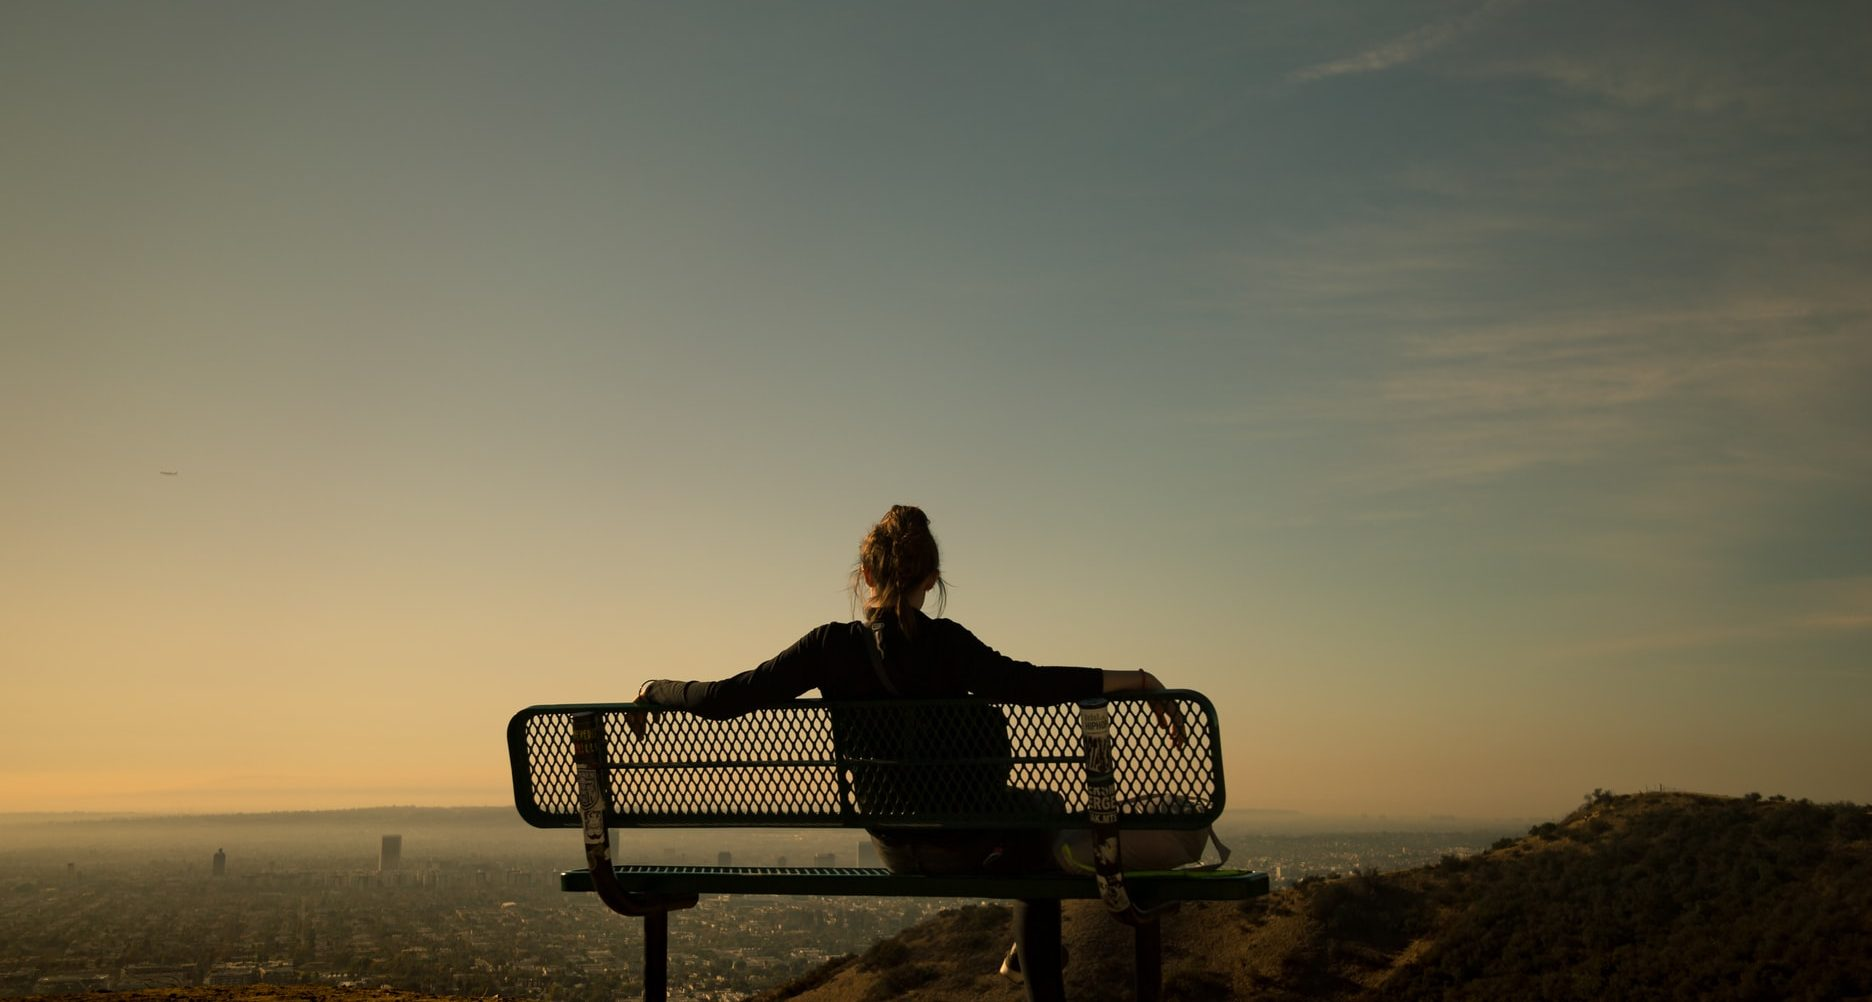 woman sitting on a bench at Runyon Canyon Park at sunset